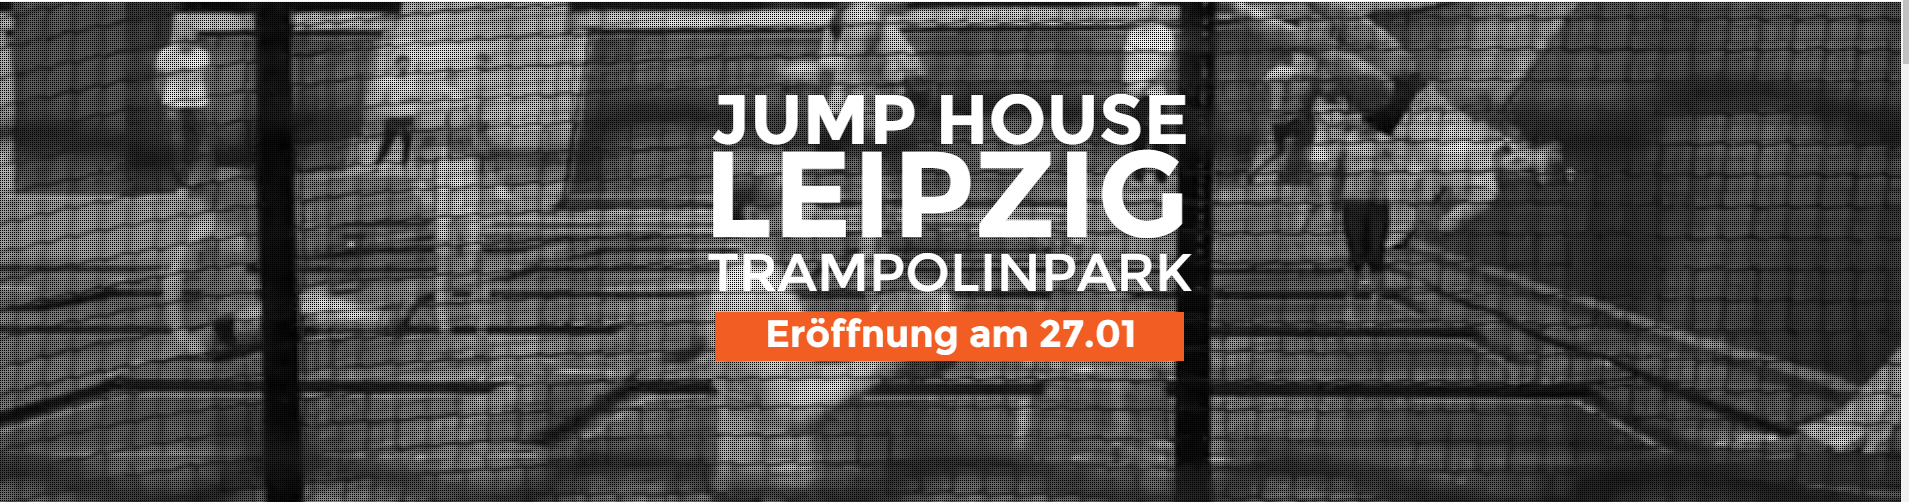 Trampolinpark JUMP HOUSE LEIPZIG